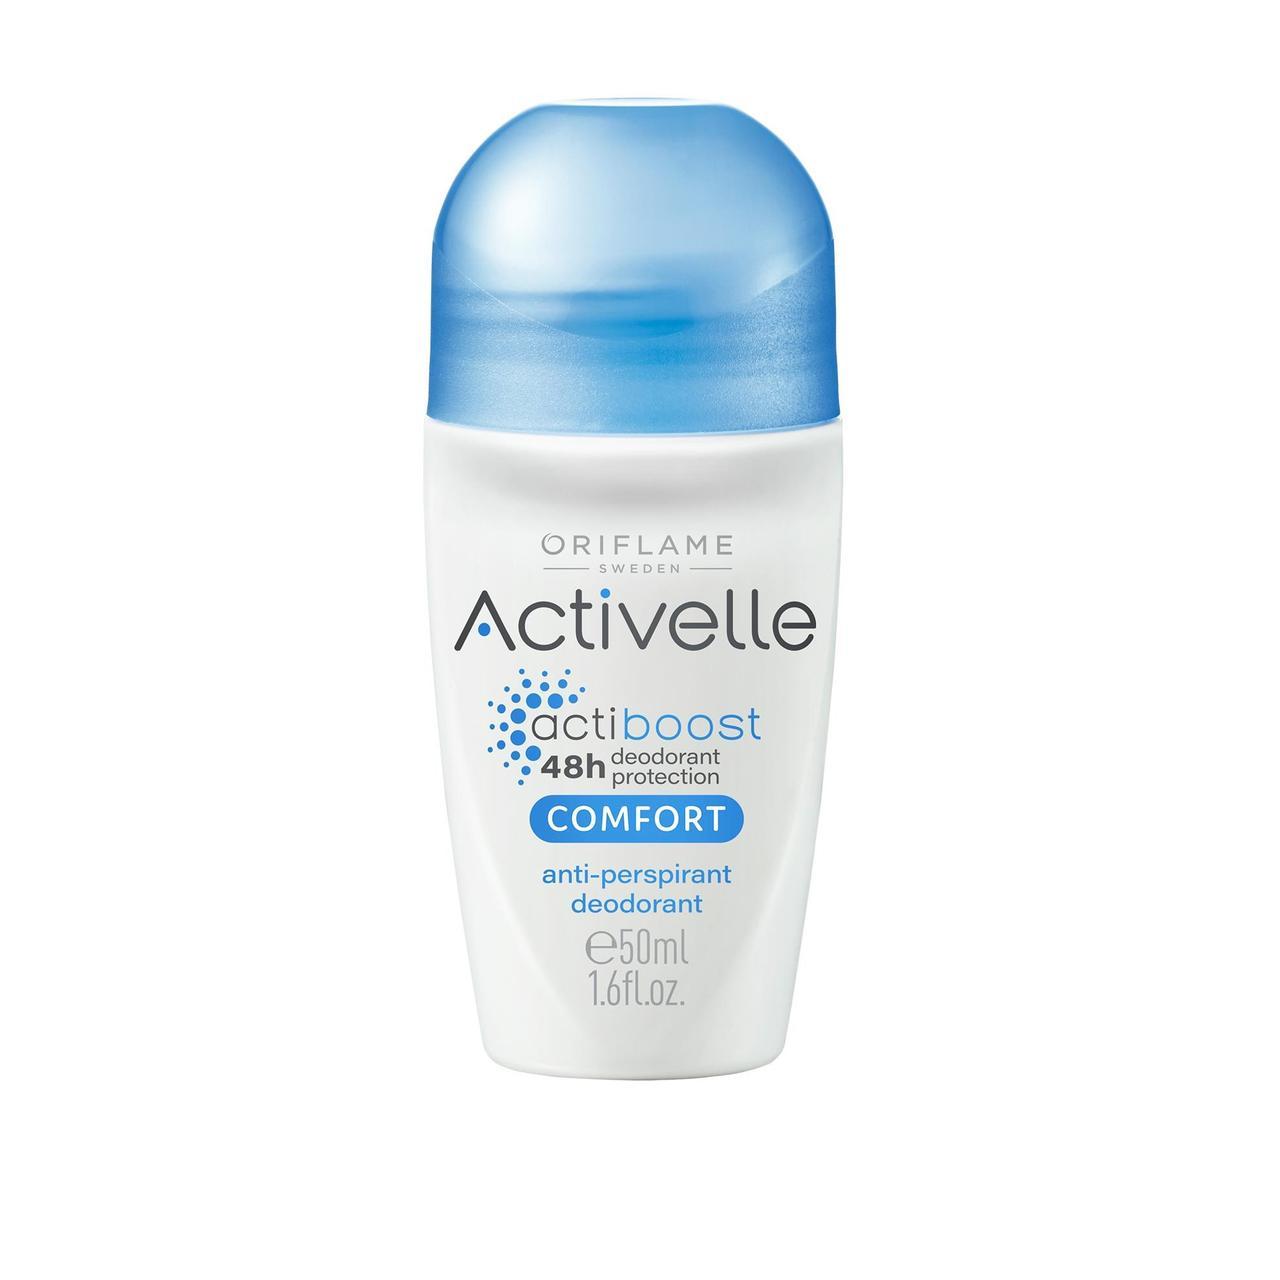 Шариковый дезодорант-антиперспирант Activelle Oriflame